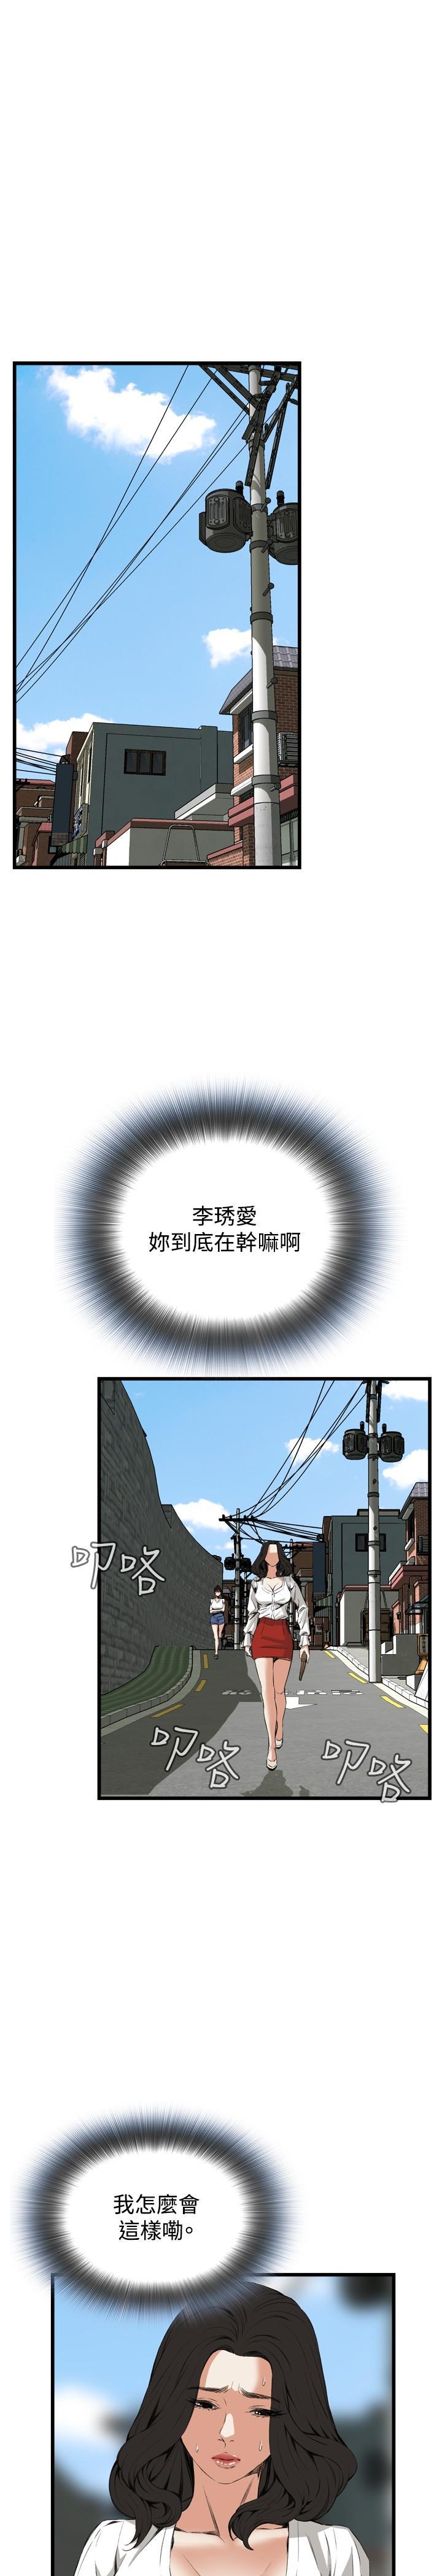 Take a Peek 偷窥 Ch.39~55 [Chinese]中文 378